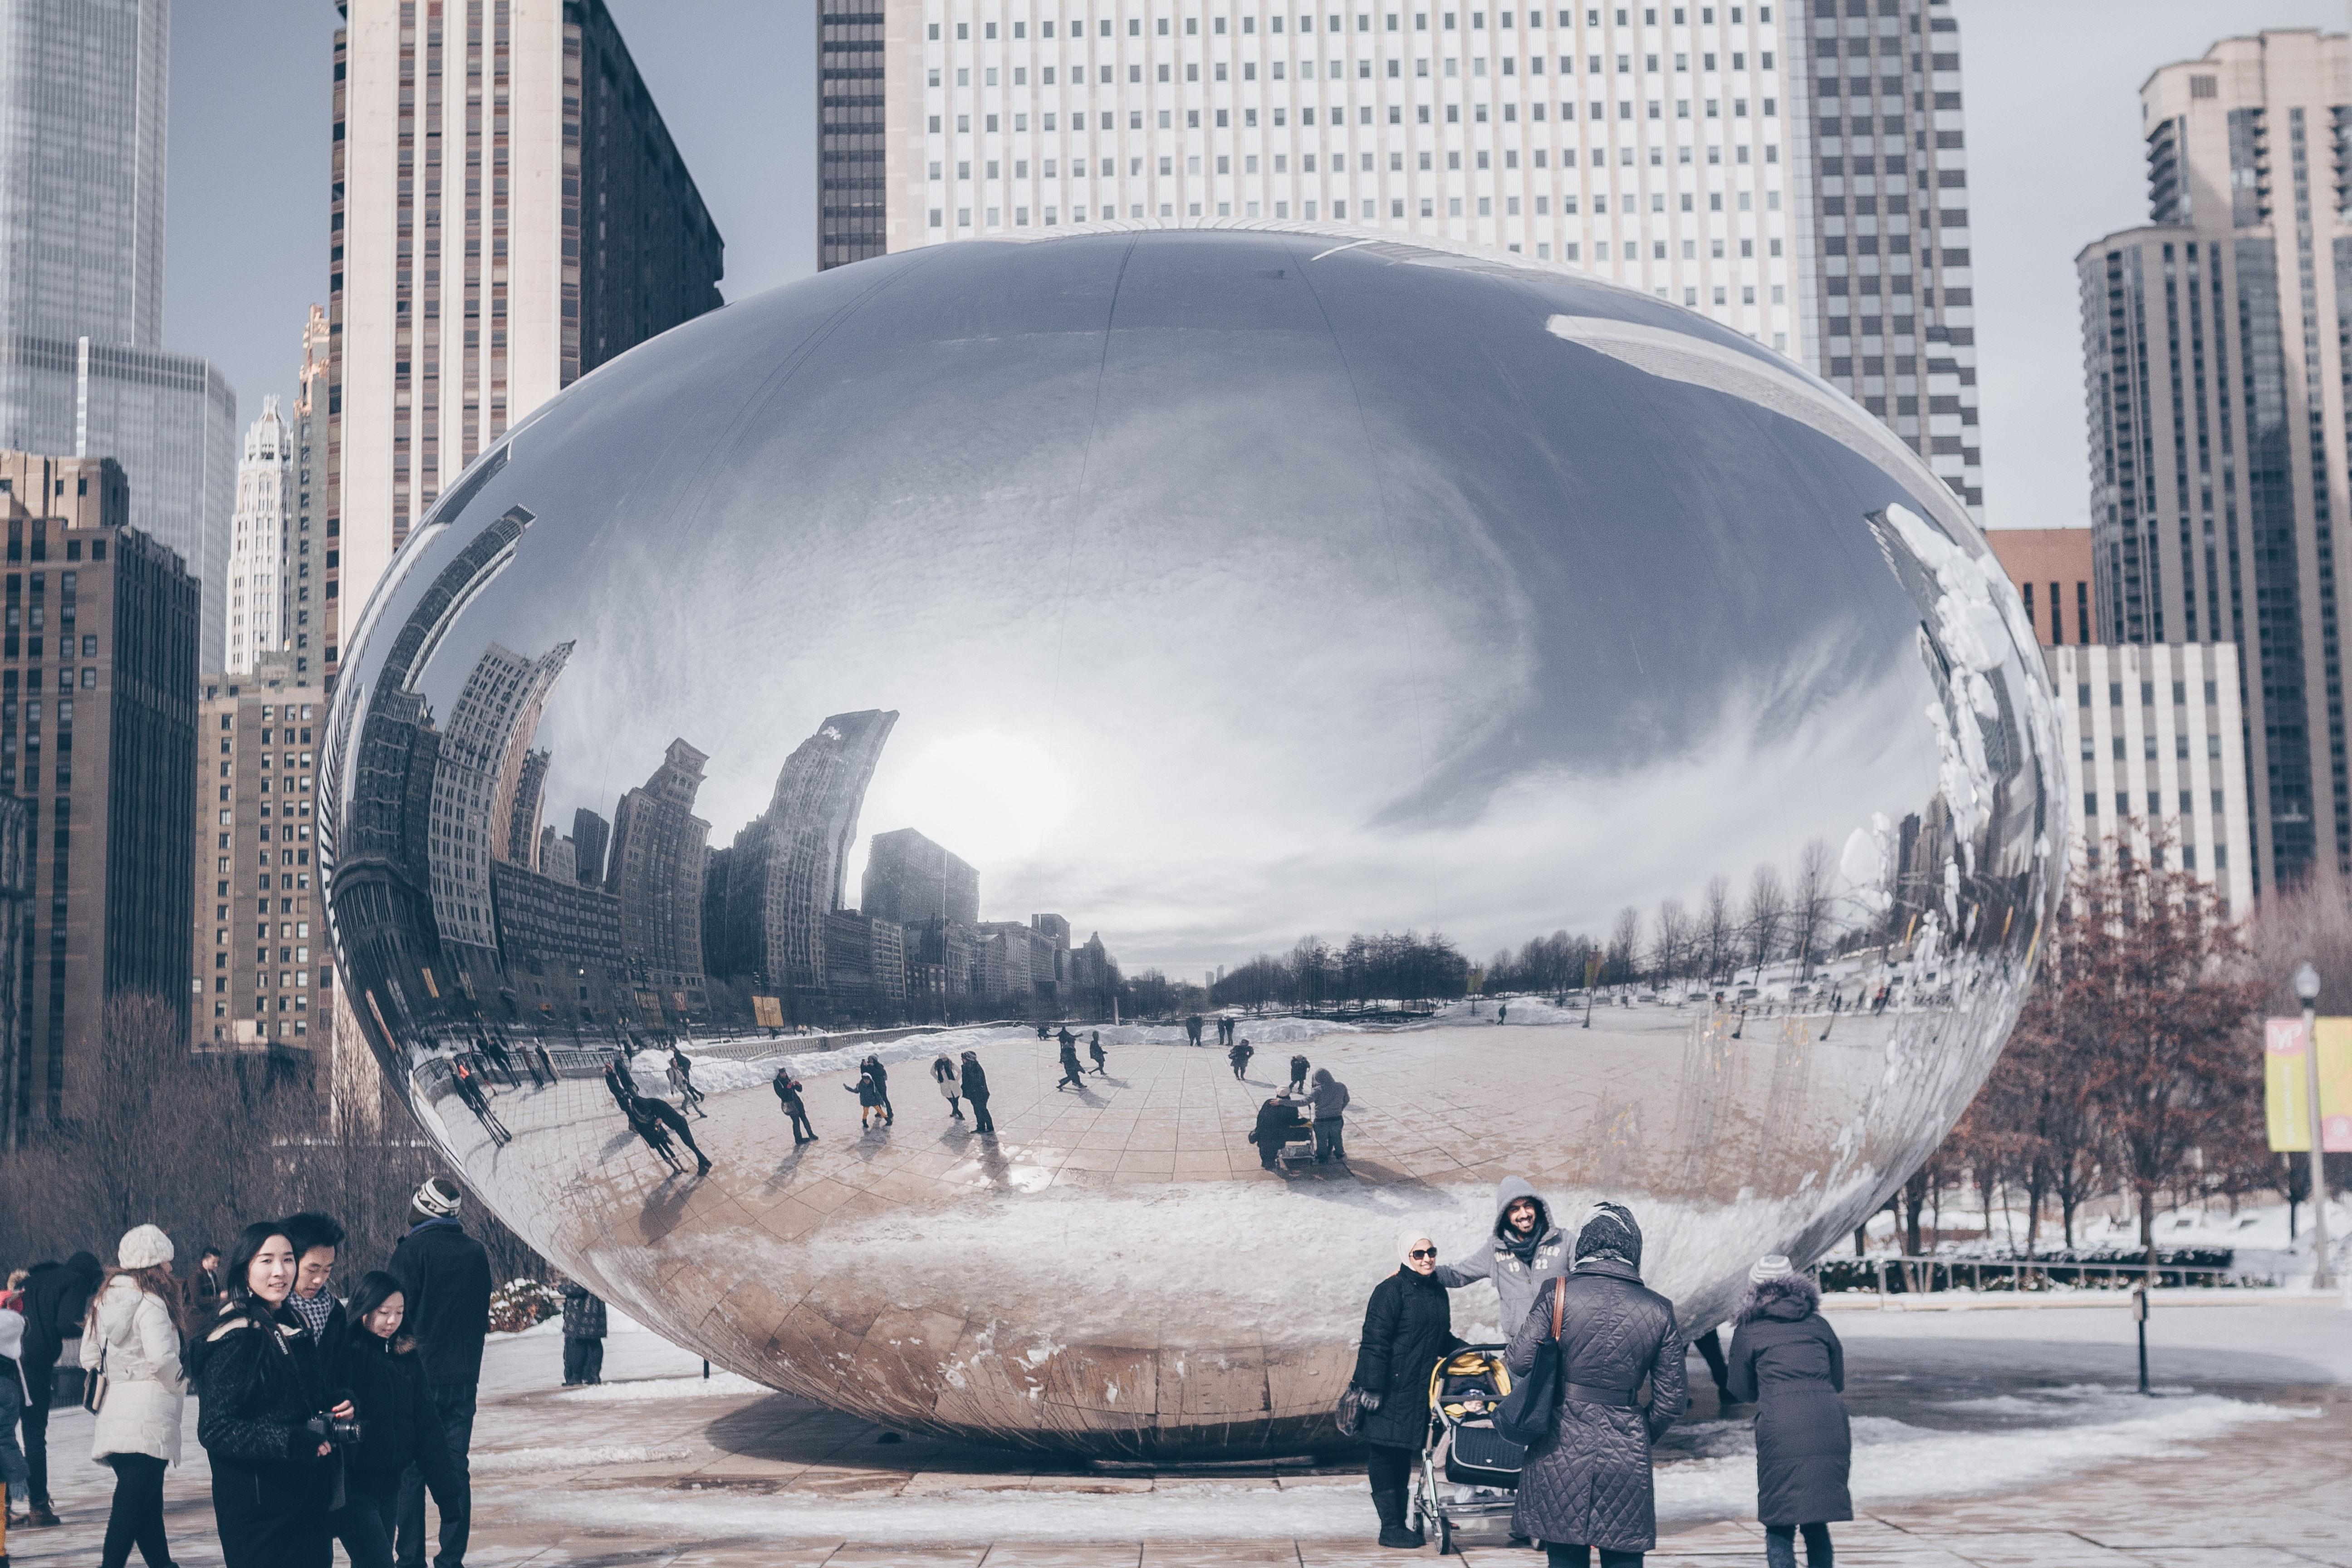 Sphere shape structure photo